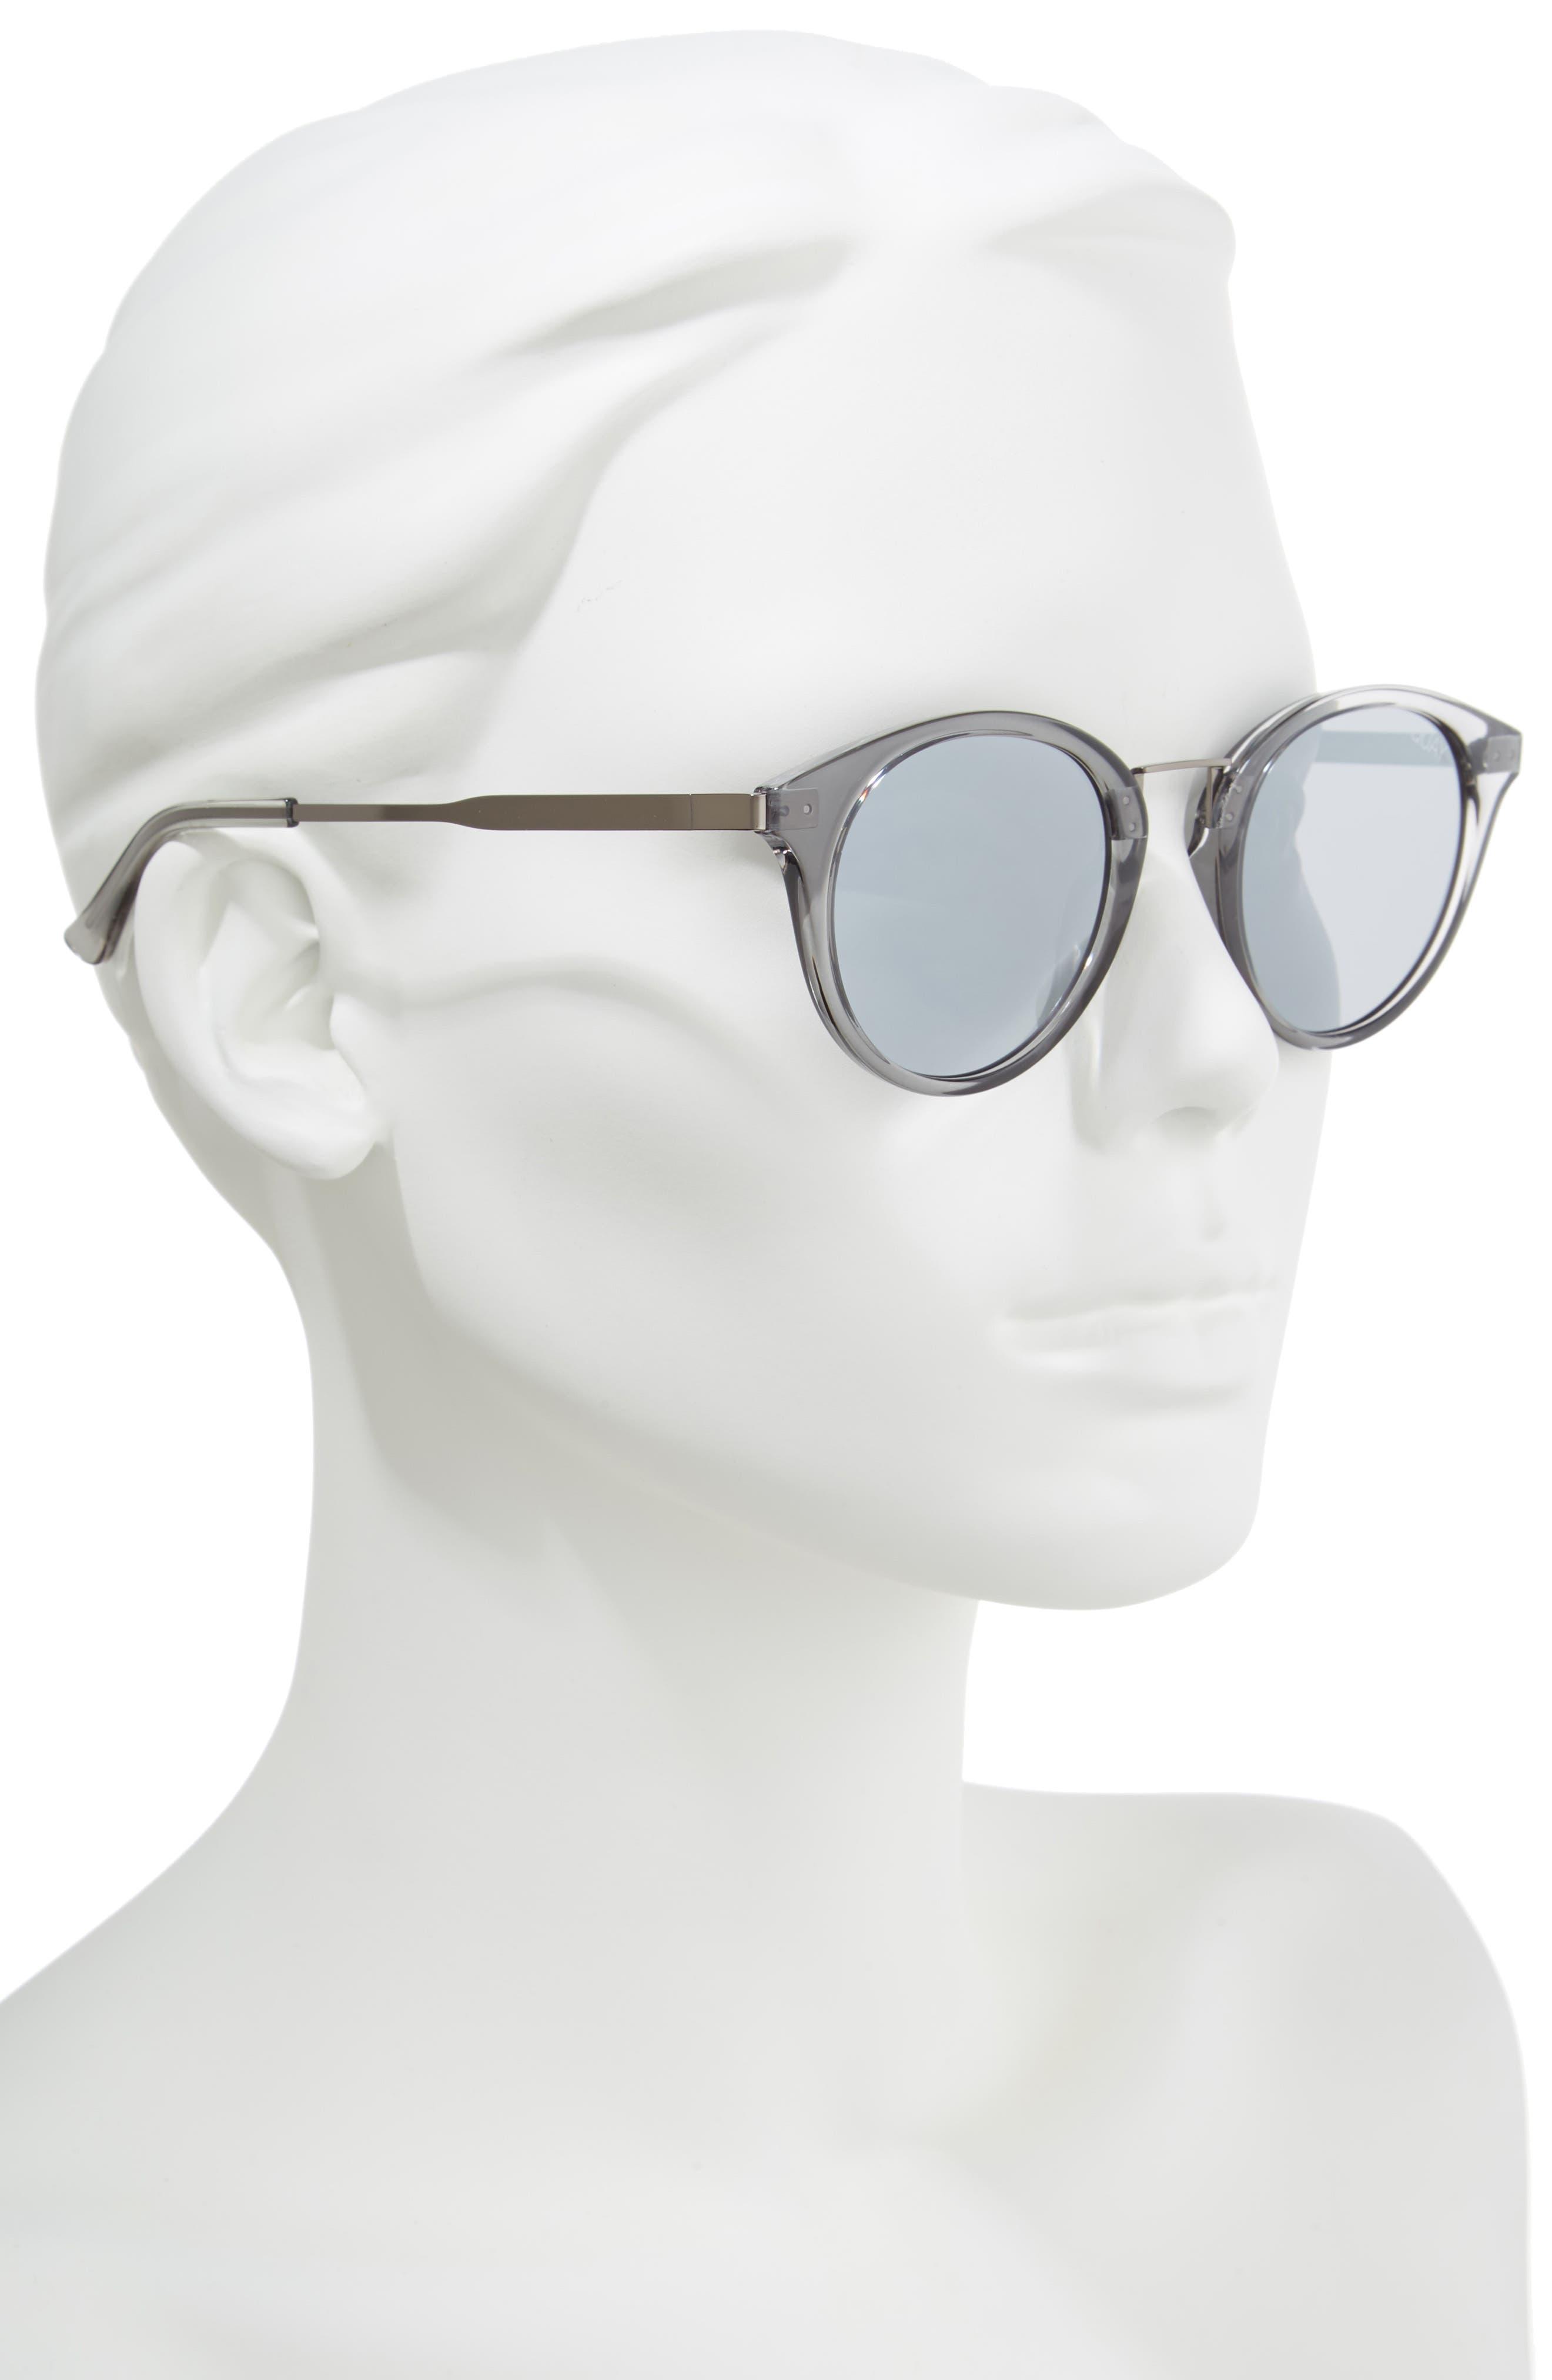 Gotta Run 48mm Sunglasses,                             Alternate thumbnail 2, color,                             Grey/ Silver